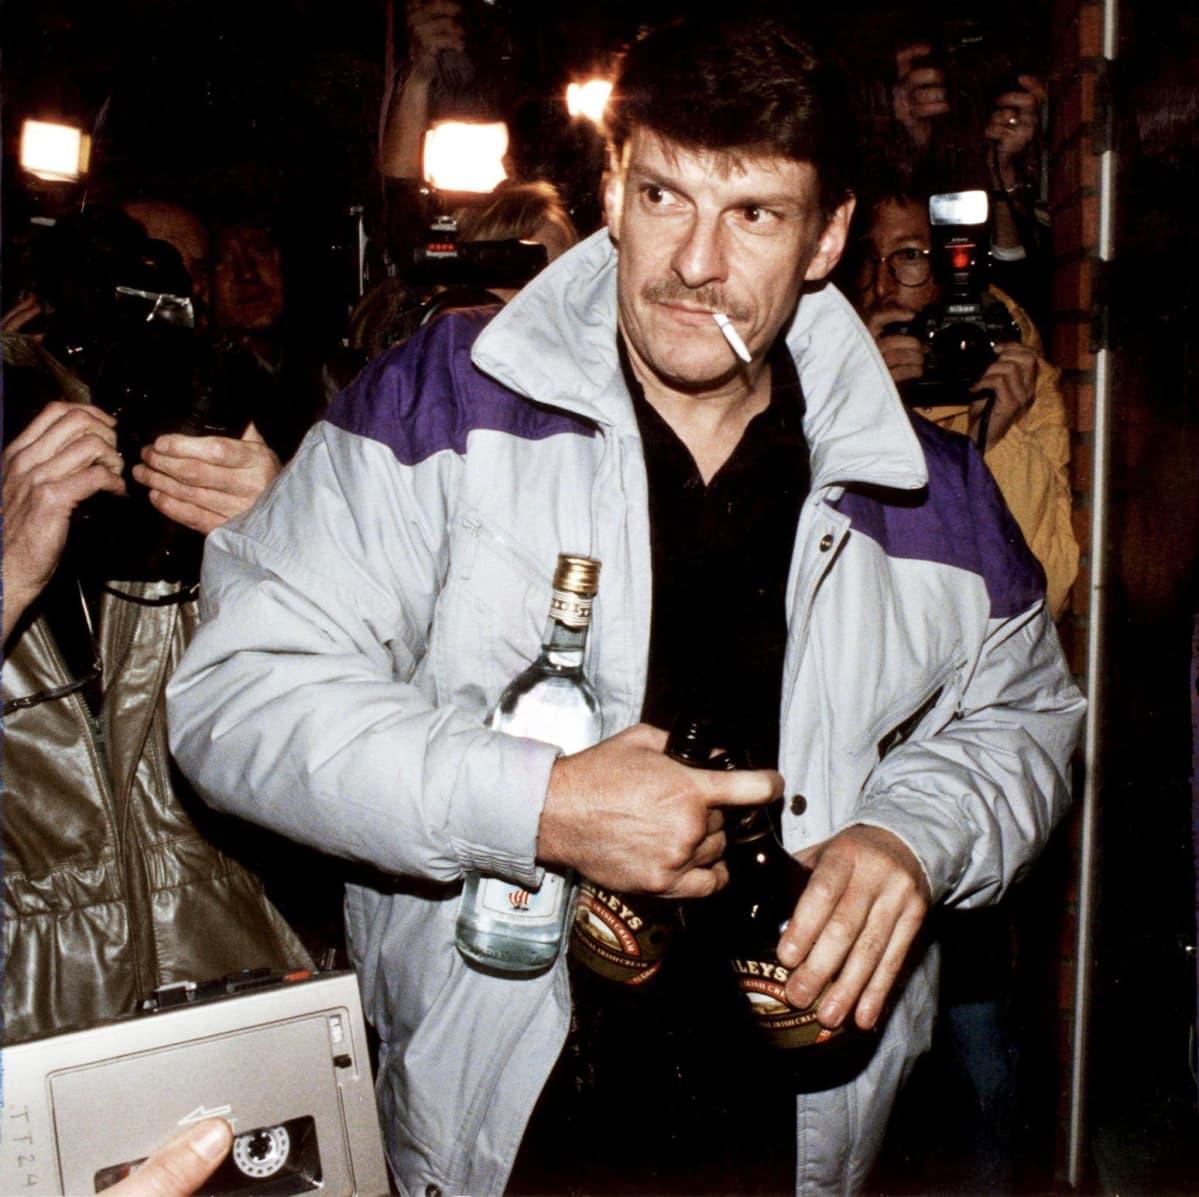 Murhasta epäilty Christer Pettersson 12.10.1998.